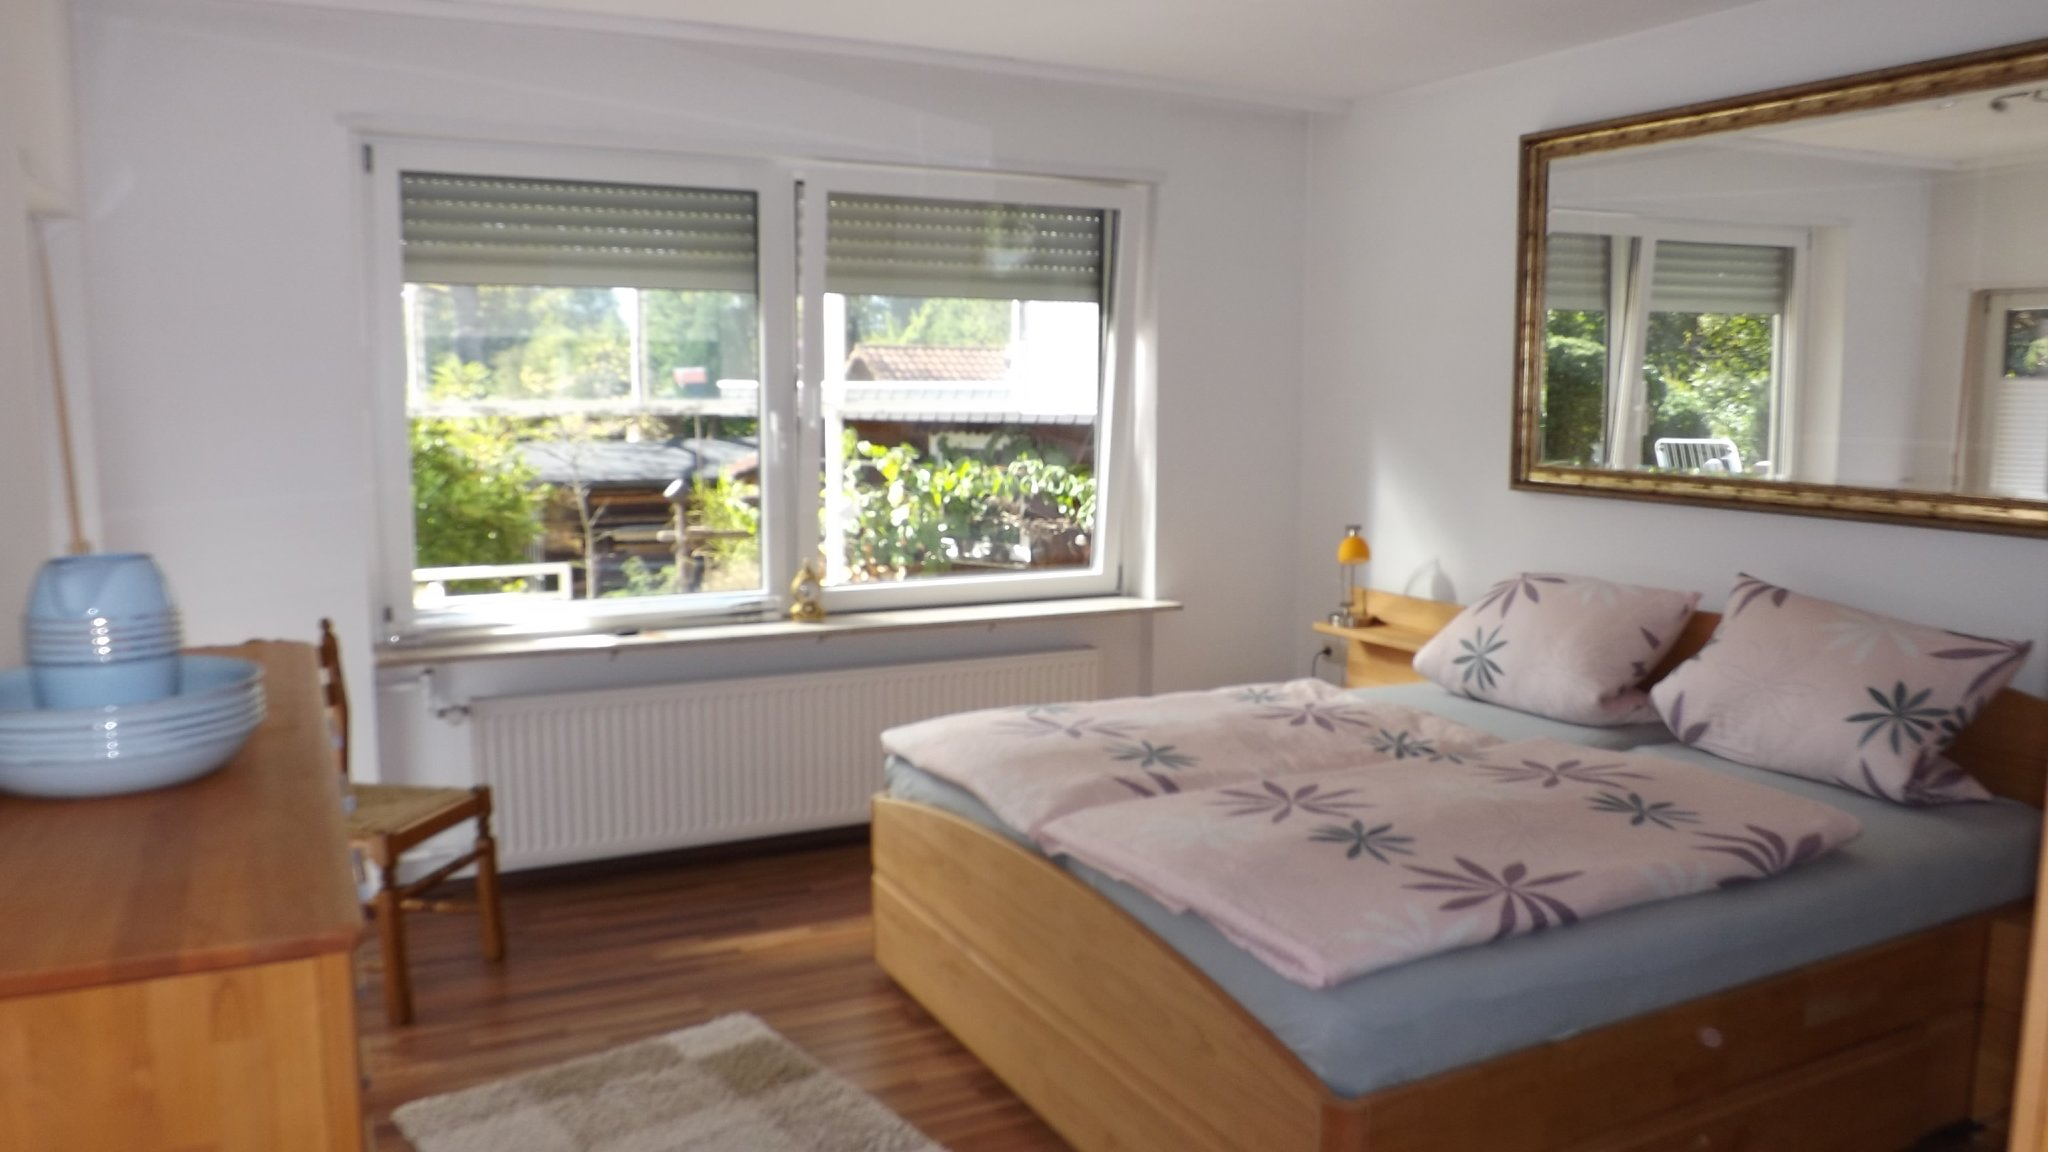 Wohnung Fr�hnsburg